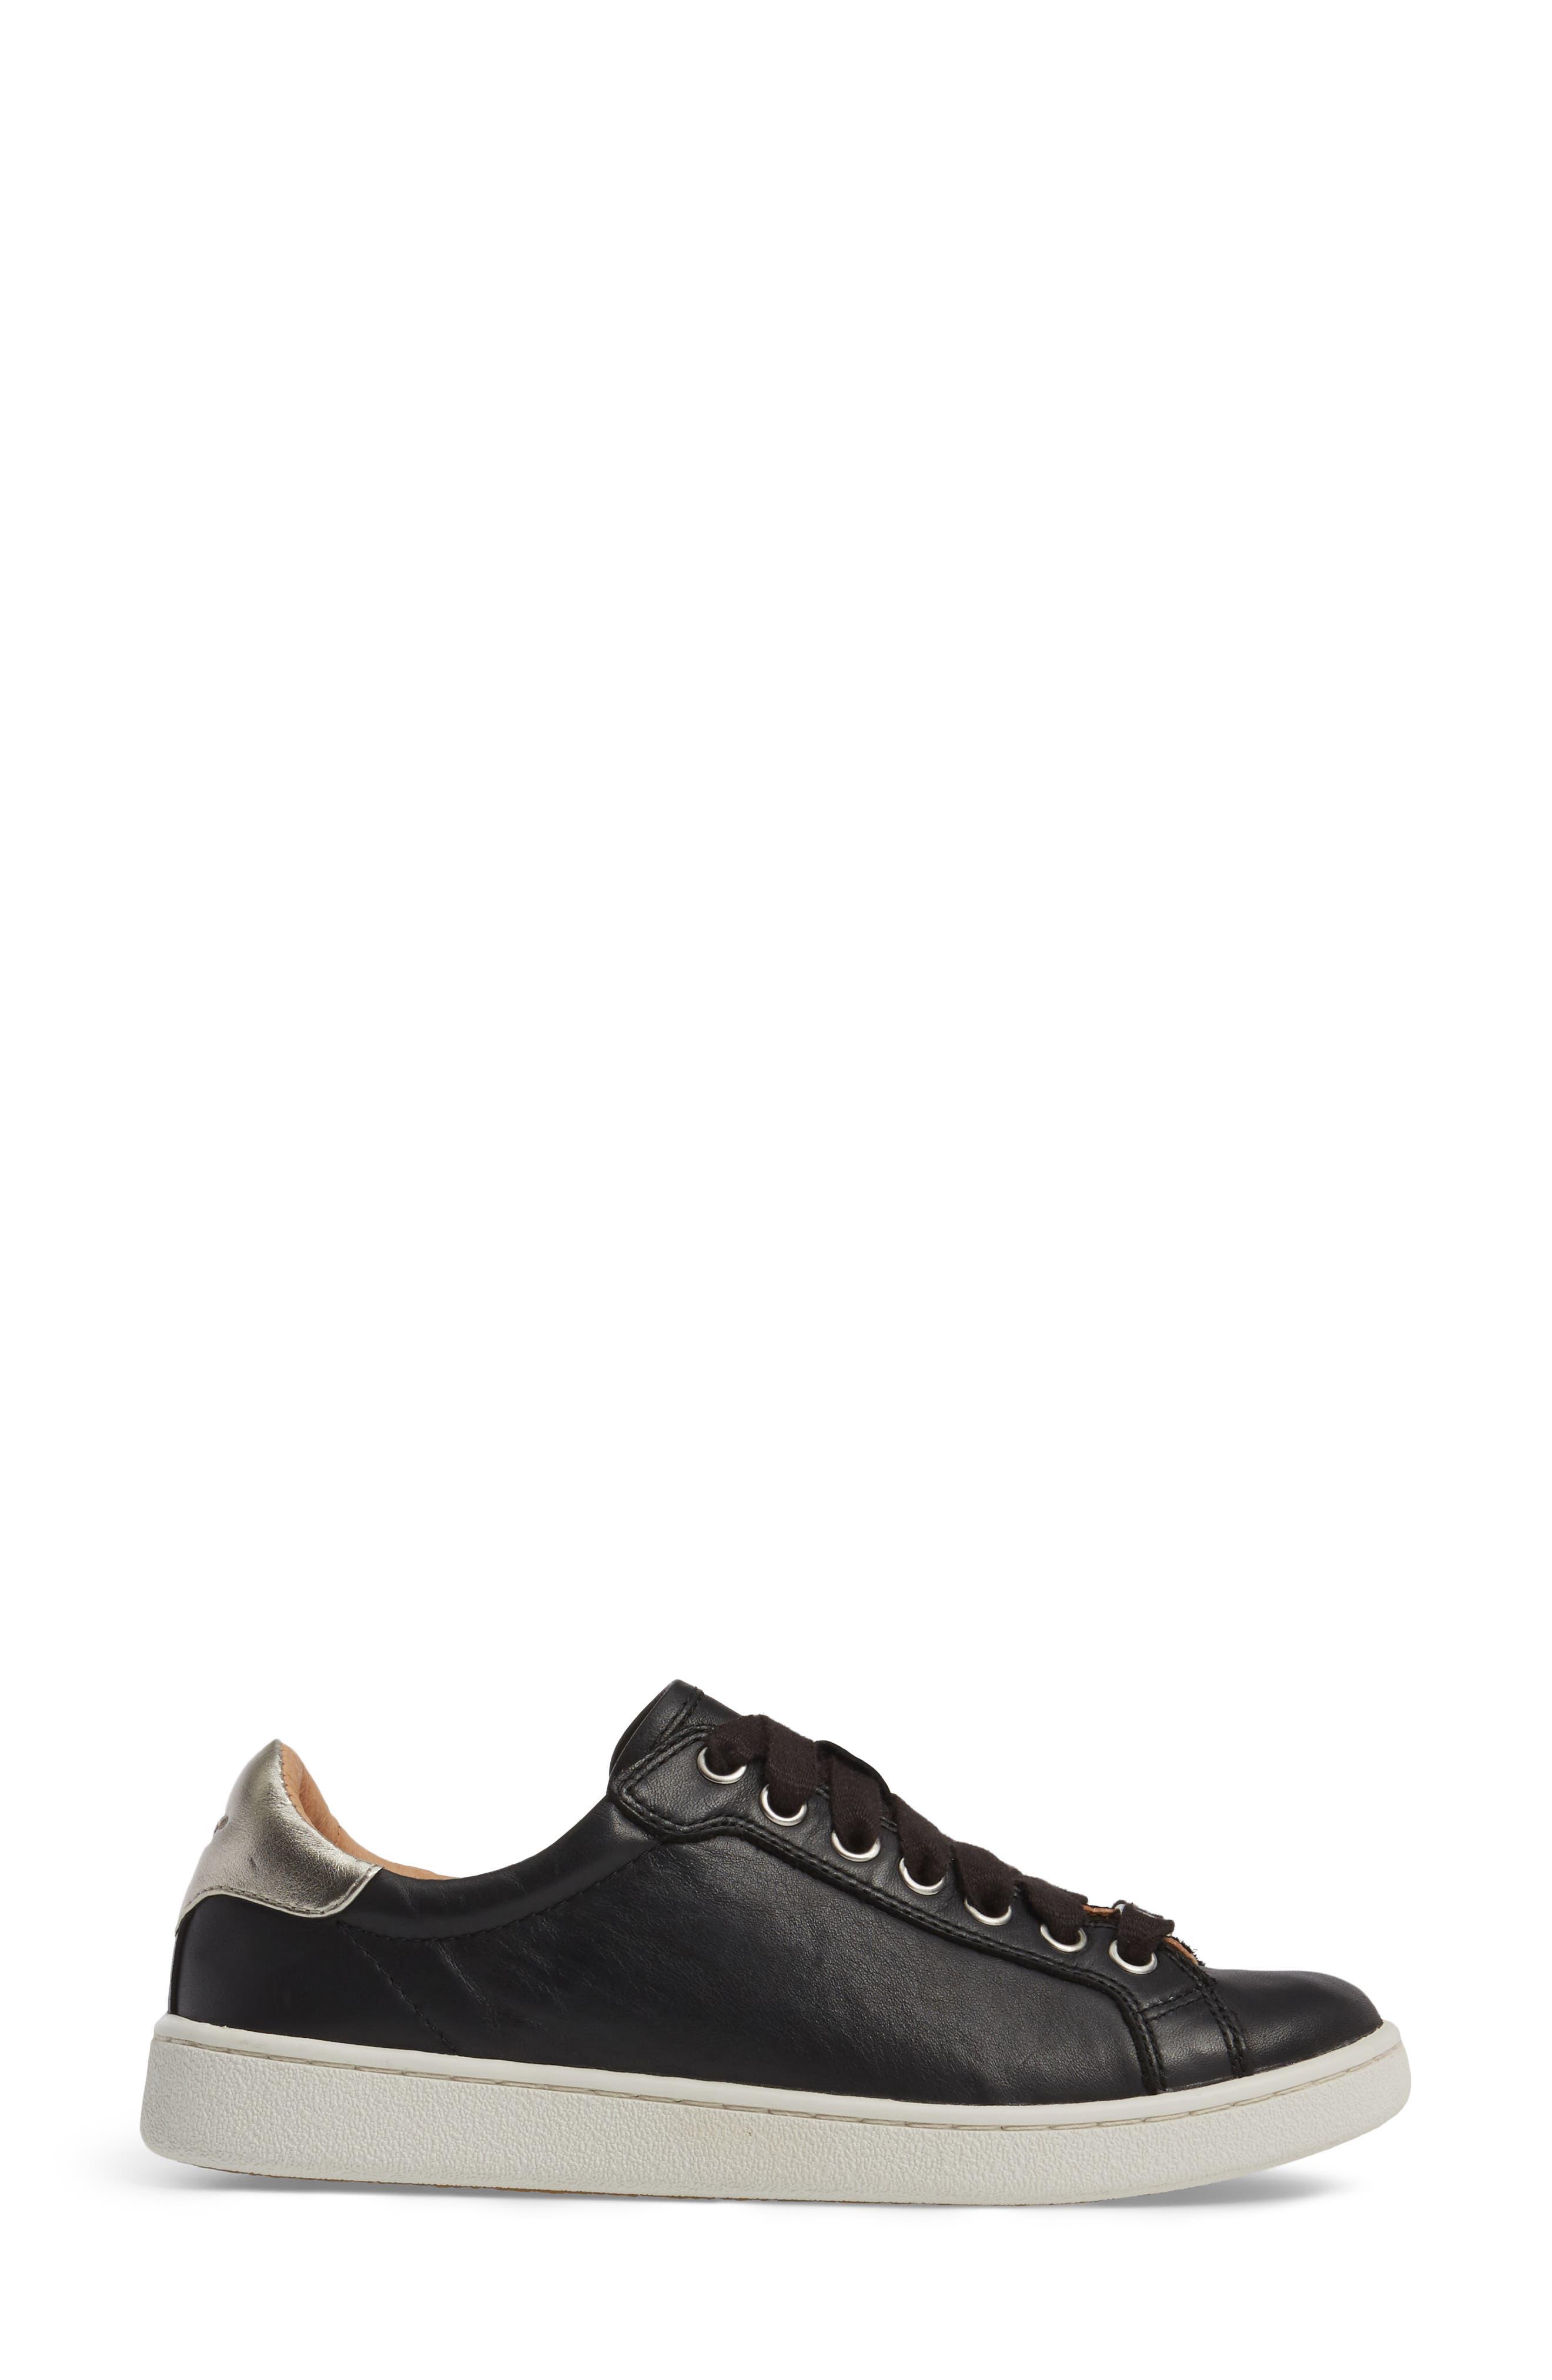 UGG<SUP>®</SUP>, Milo Sneaker, Alternate thumbnail 3, color, BLACK LEATHER